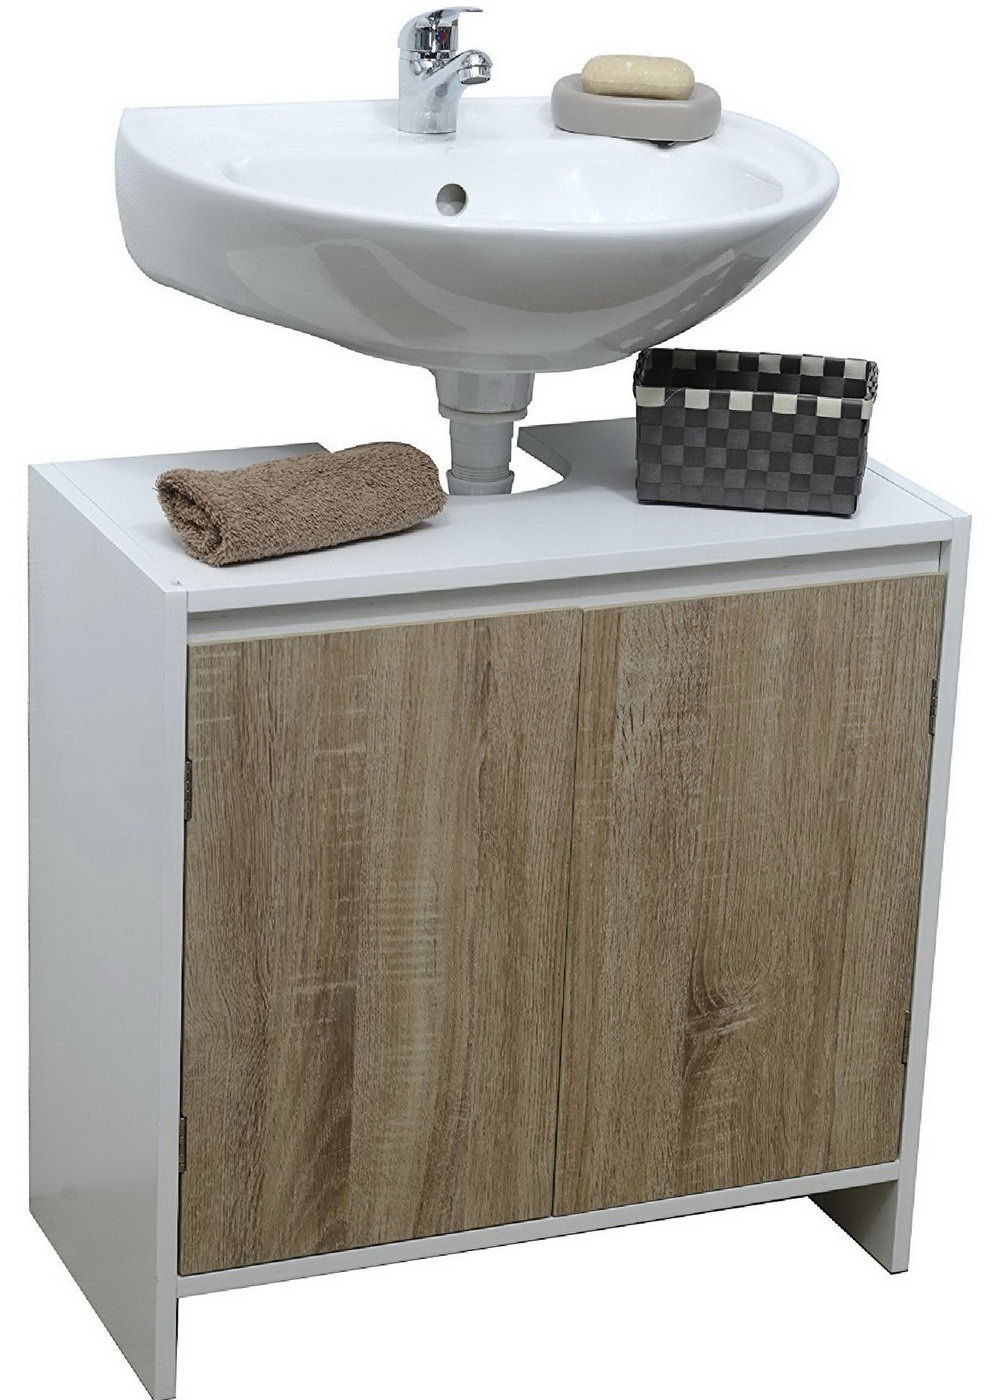 Pedestal Sink Storage Cabinet Lowes